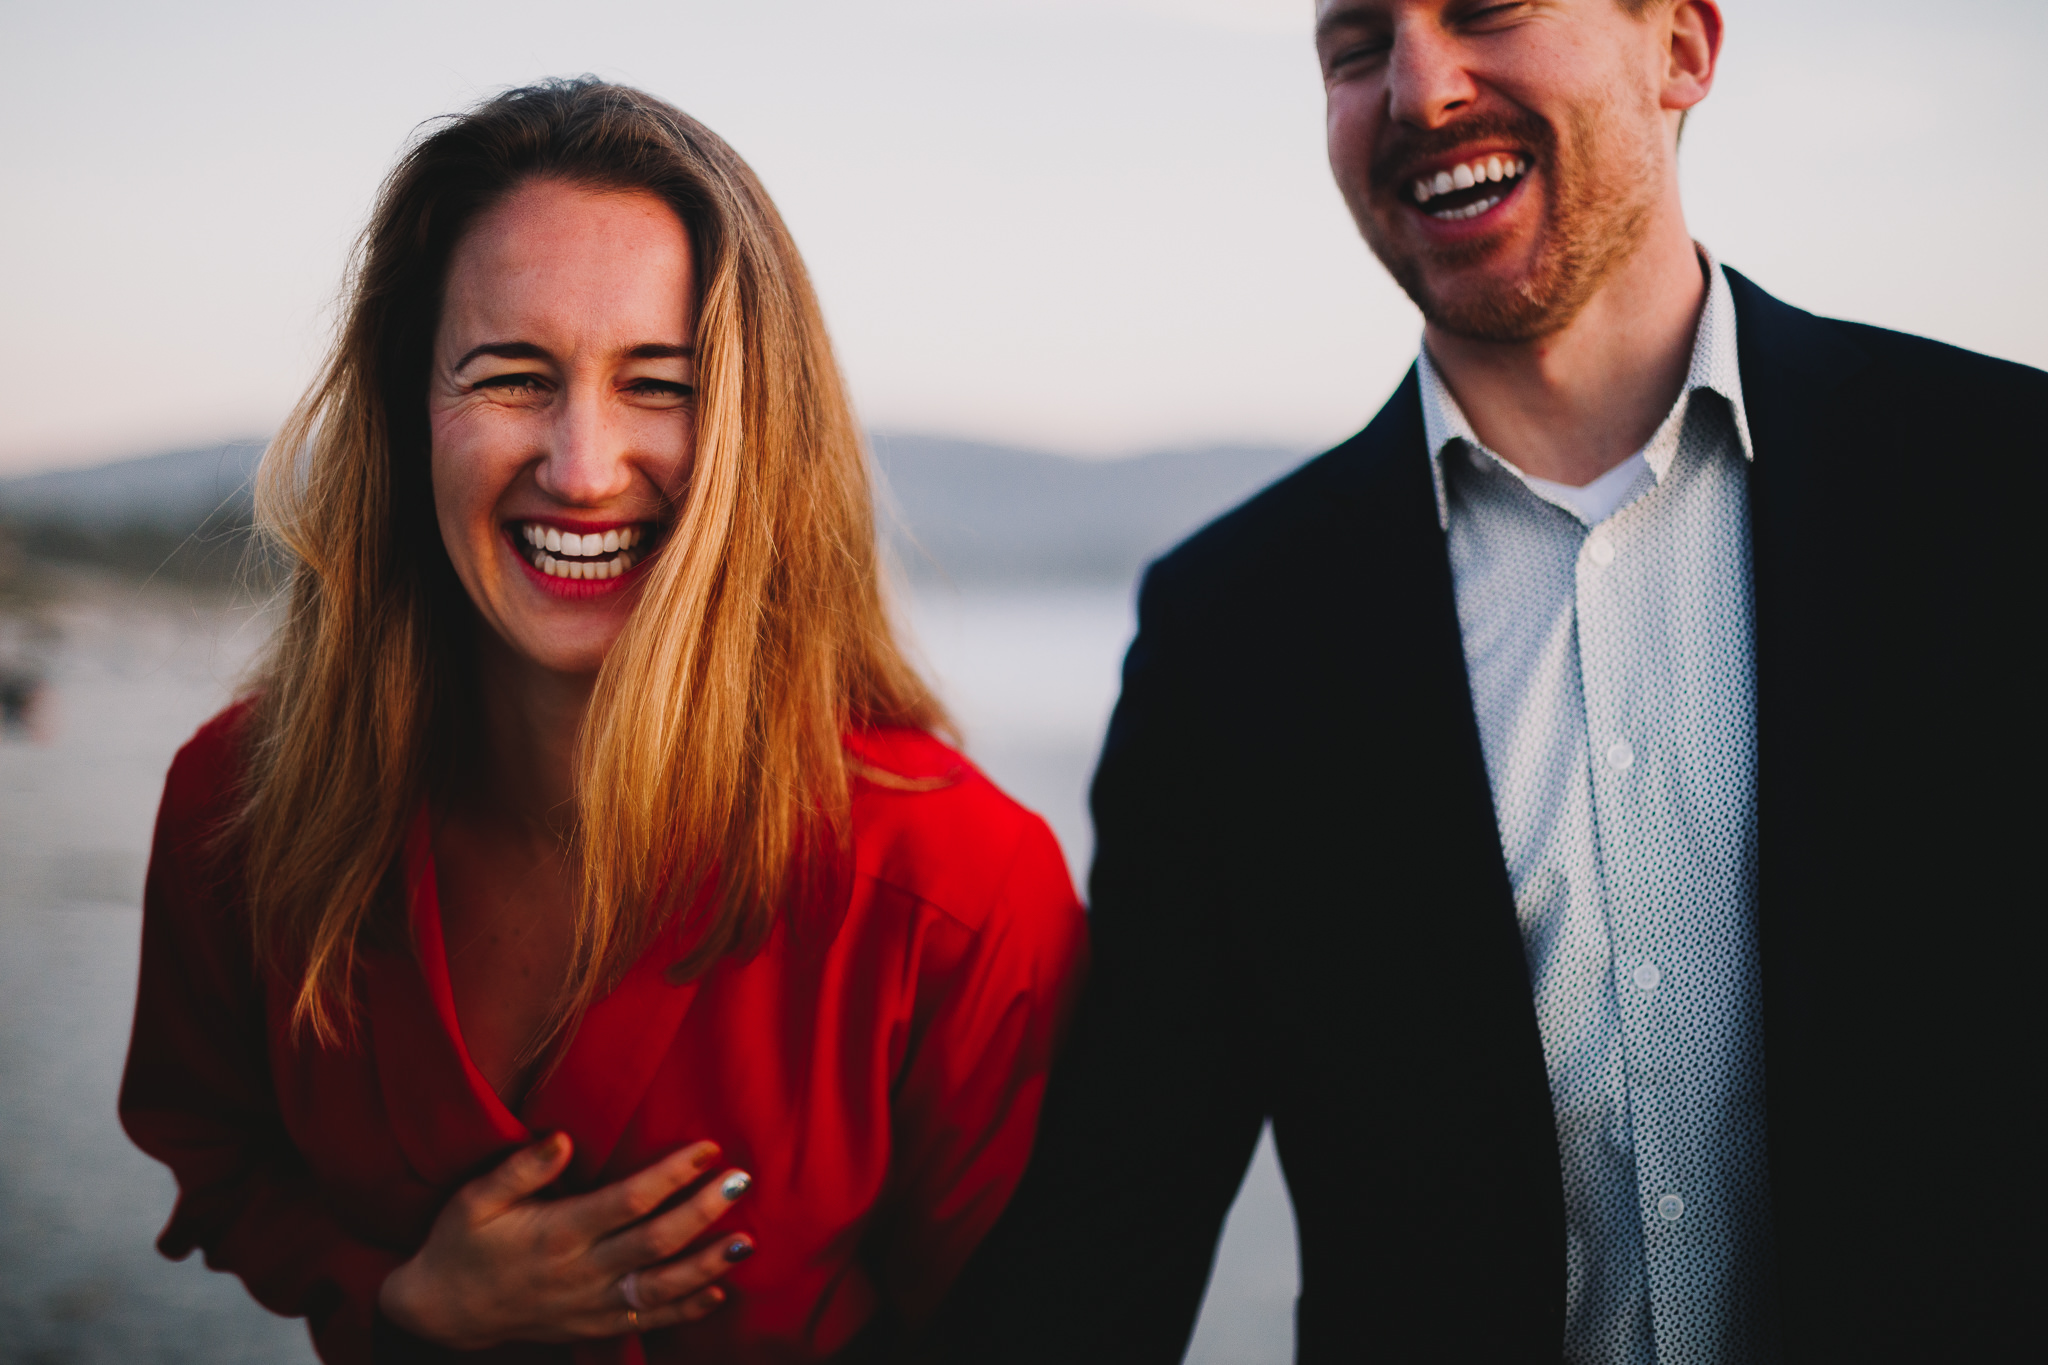 Archer Inspired Photography Carmel Beach California Wedding Engagement Lifestyle Anniversary Natural Light Photographer-101.jpg